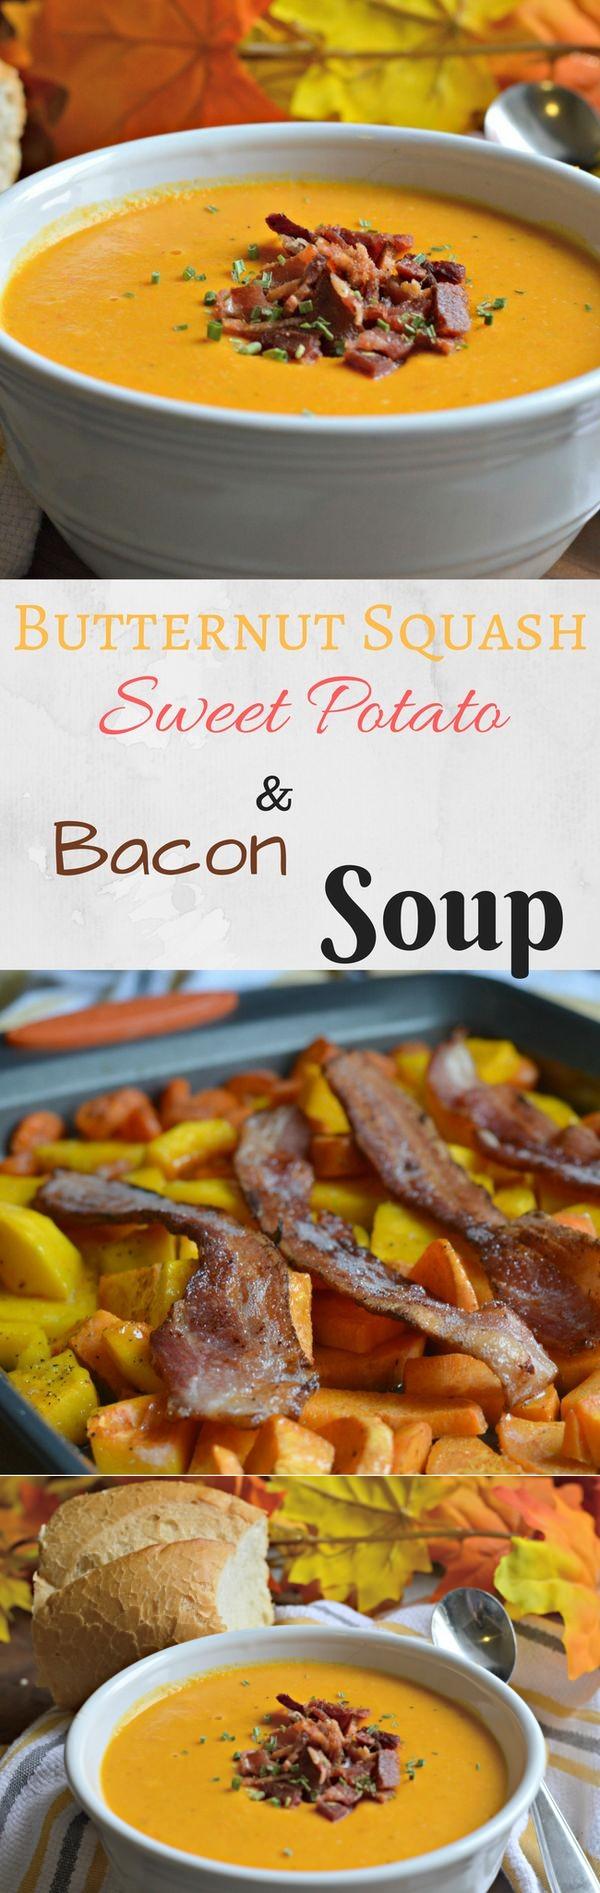 Butternut Squash, Sweet Potato, and Bacon Soup